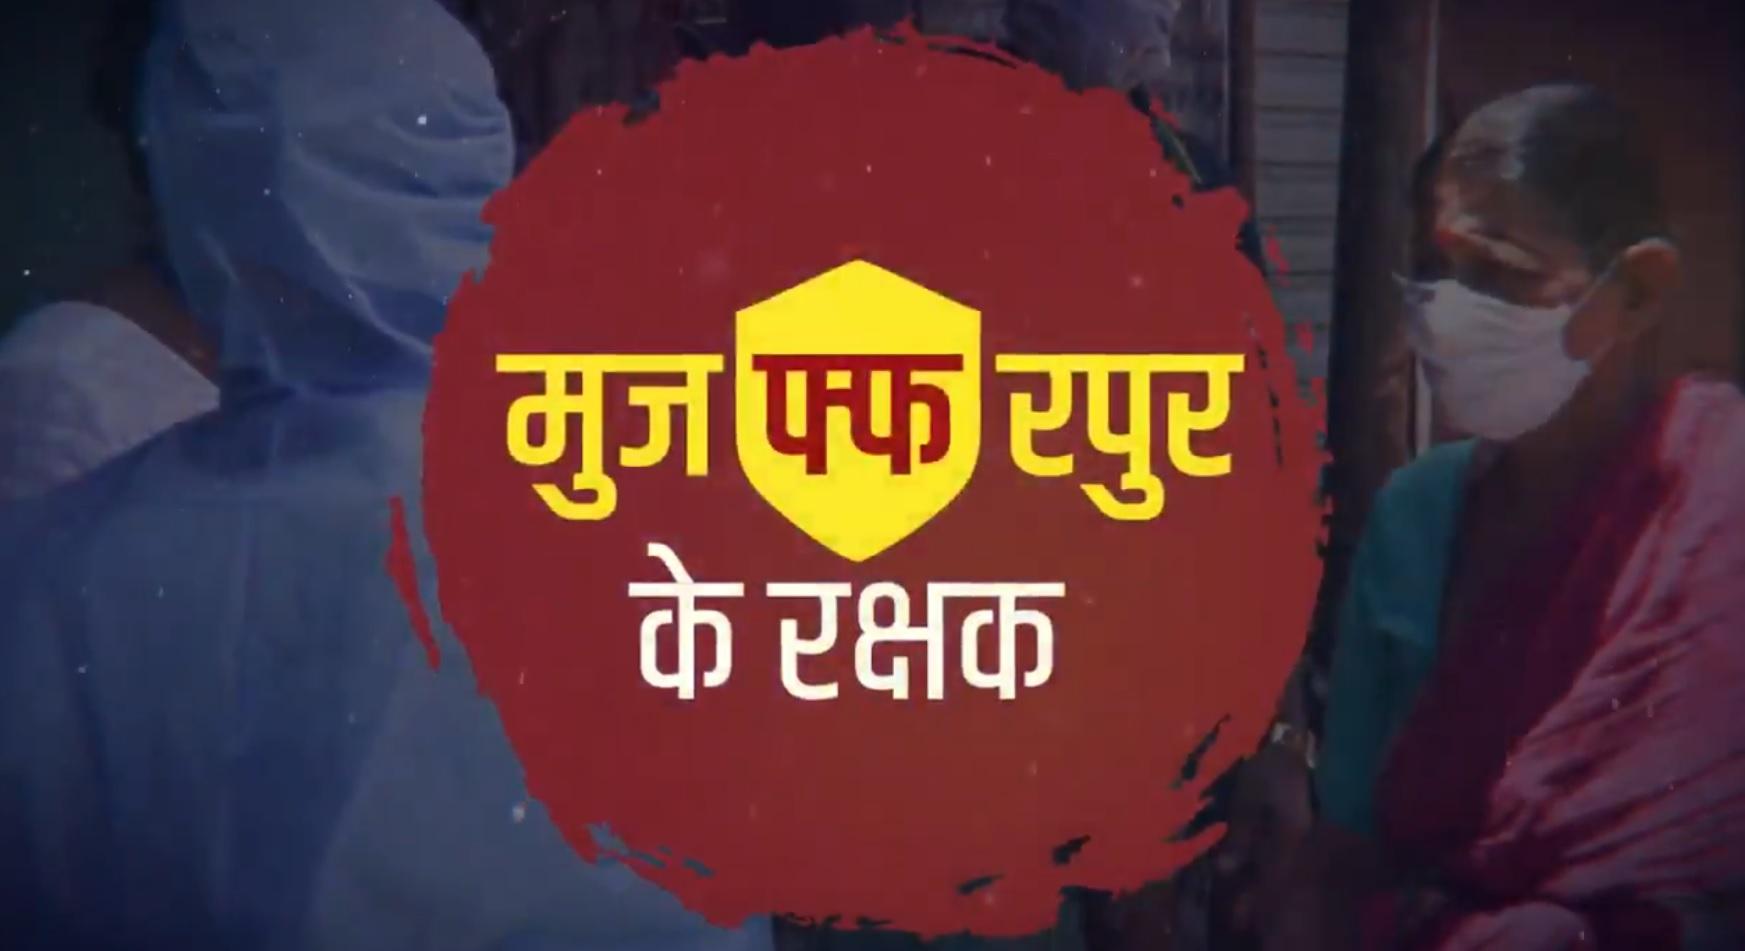 muzaffarpur ke Rakchak poster